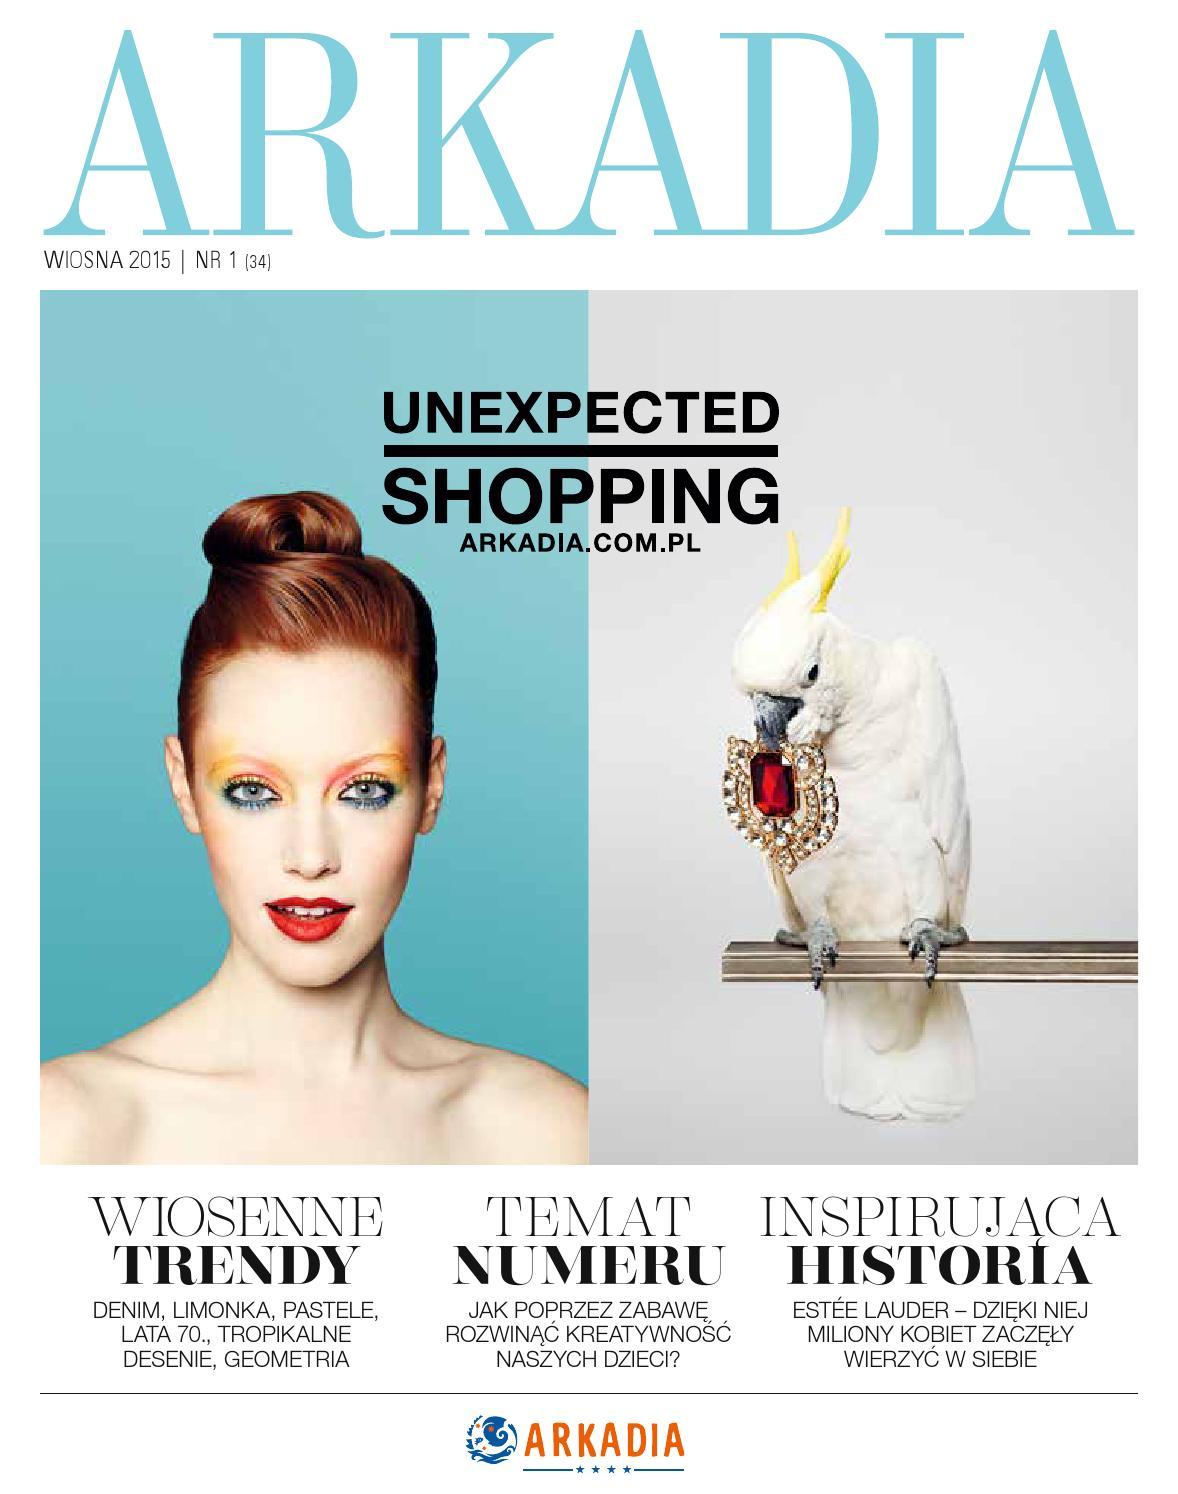 6a4f327b6db6d 2015 05 04 arkadia magazyn wiosna 2015 by Unibail Rodamco - issuu